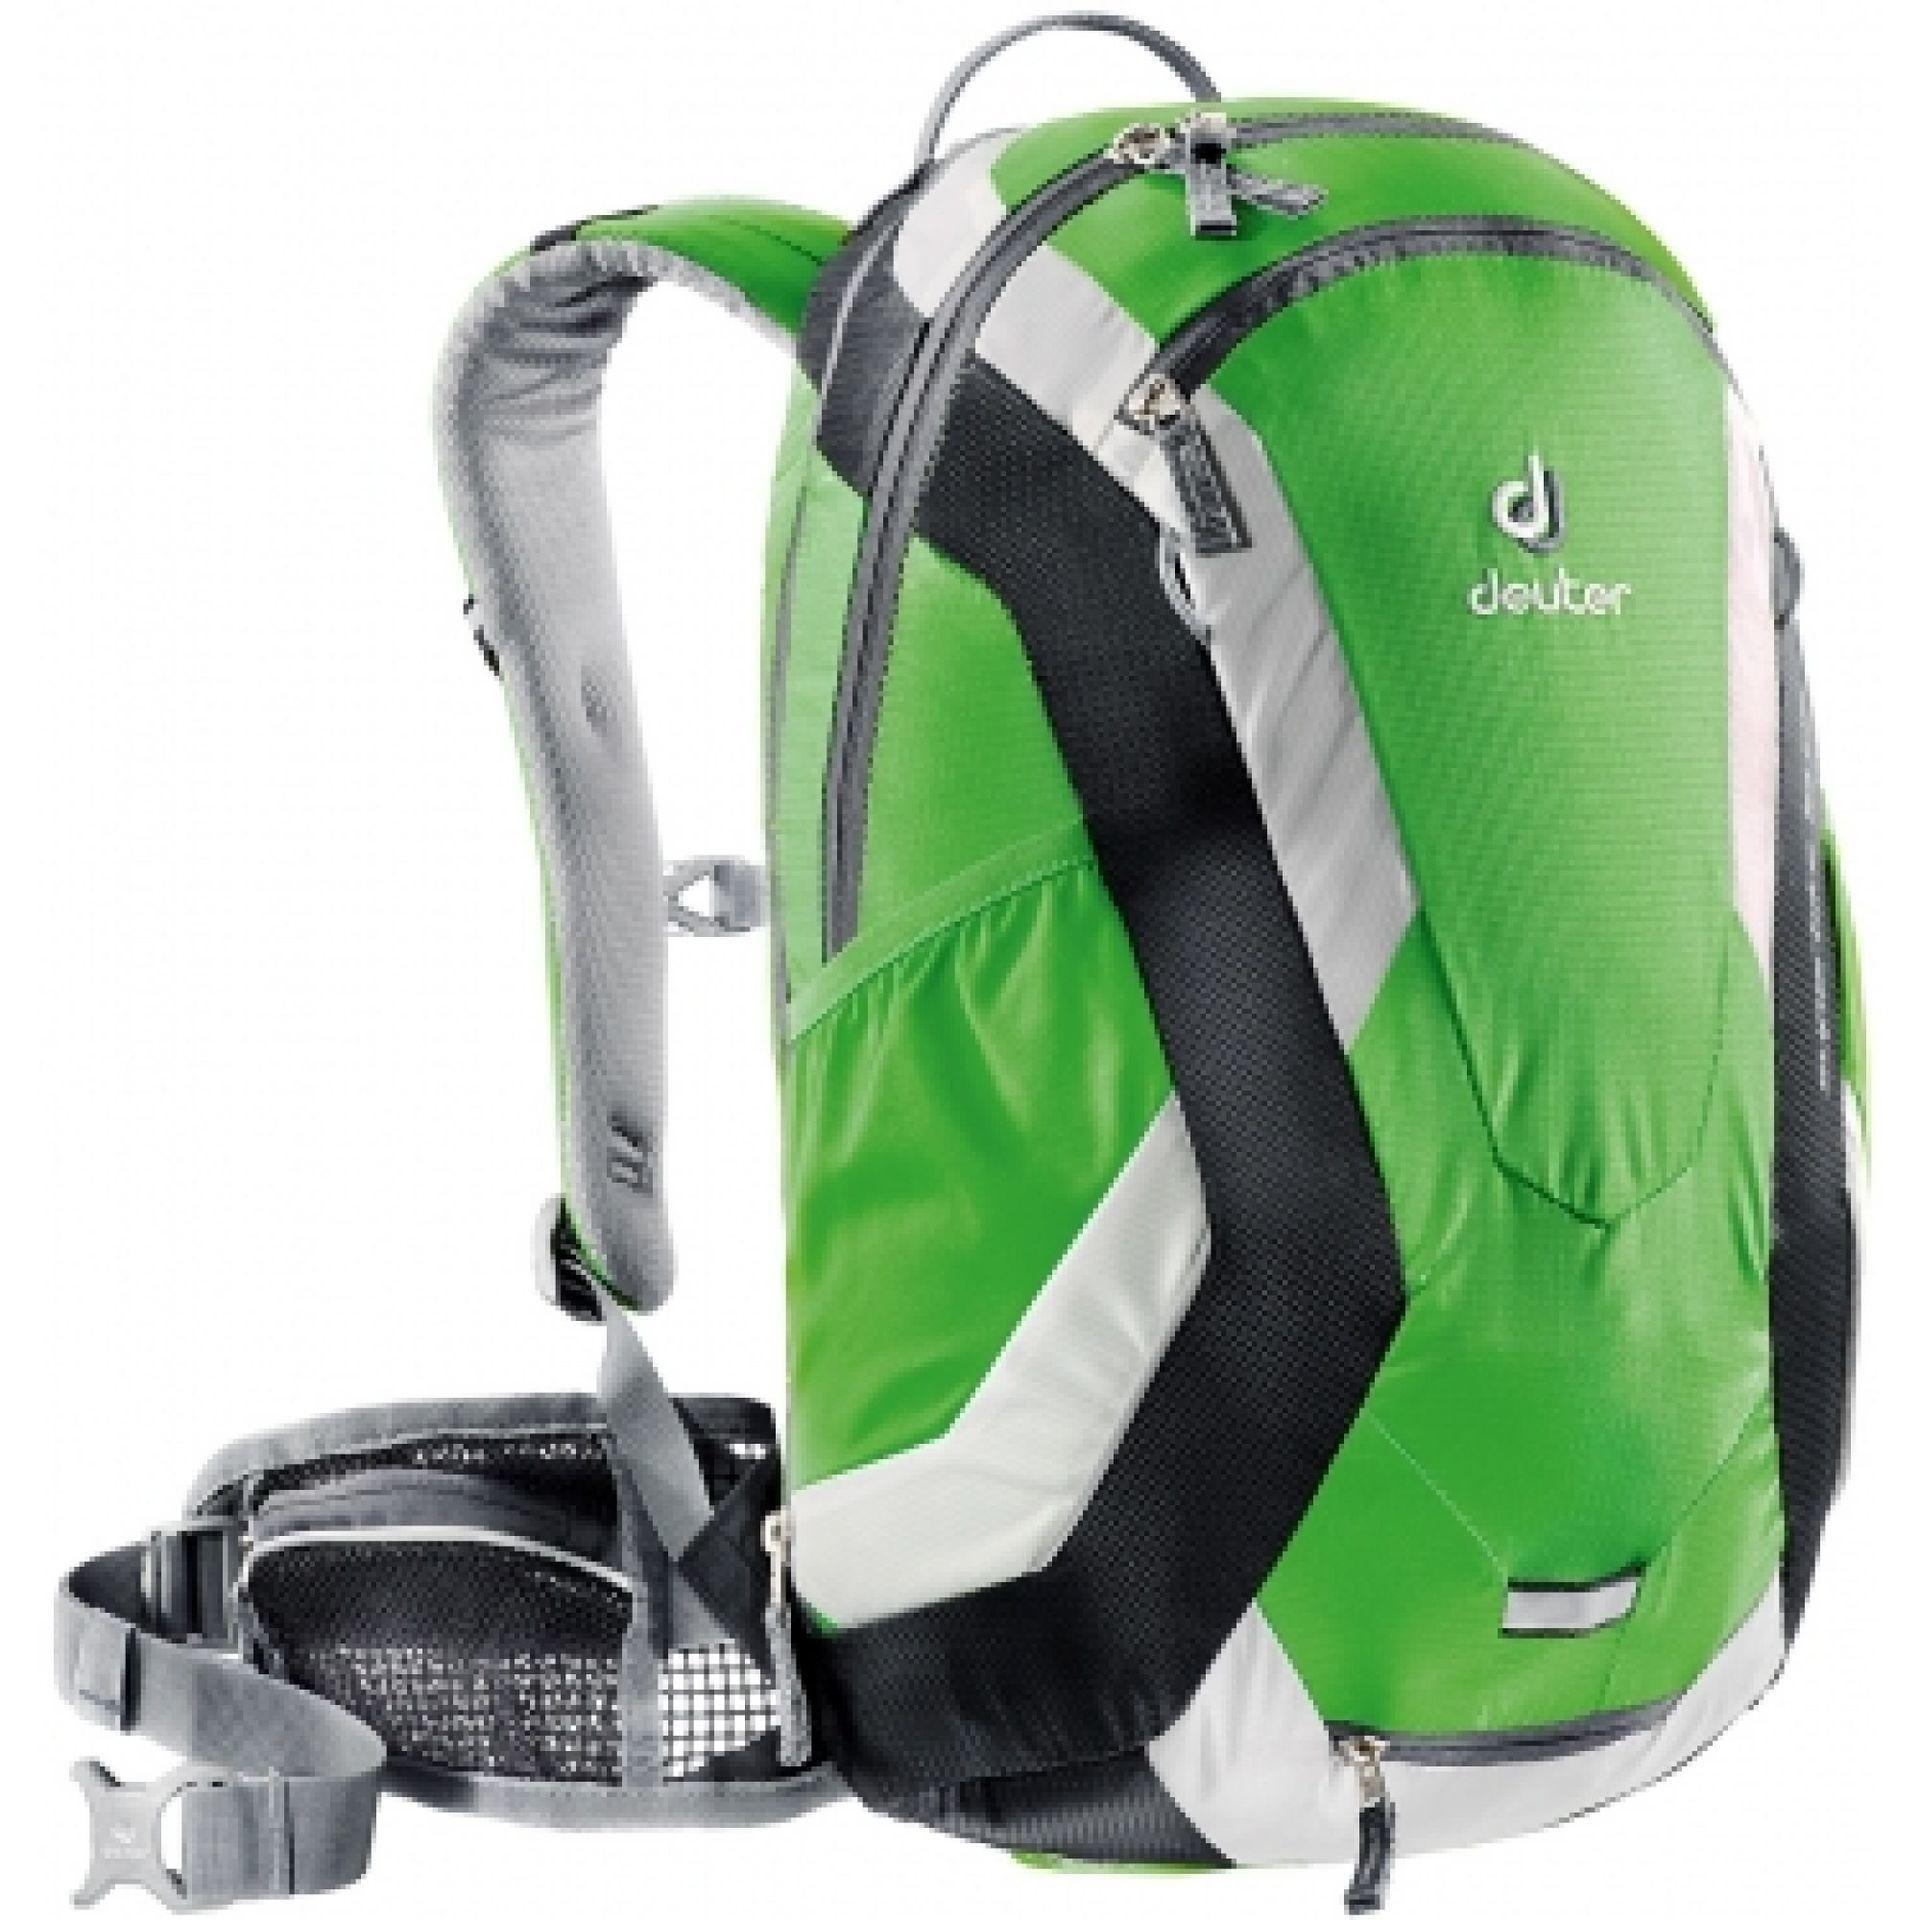 Plecak Deuter Superbike 18 EXP zielono czarny